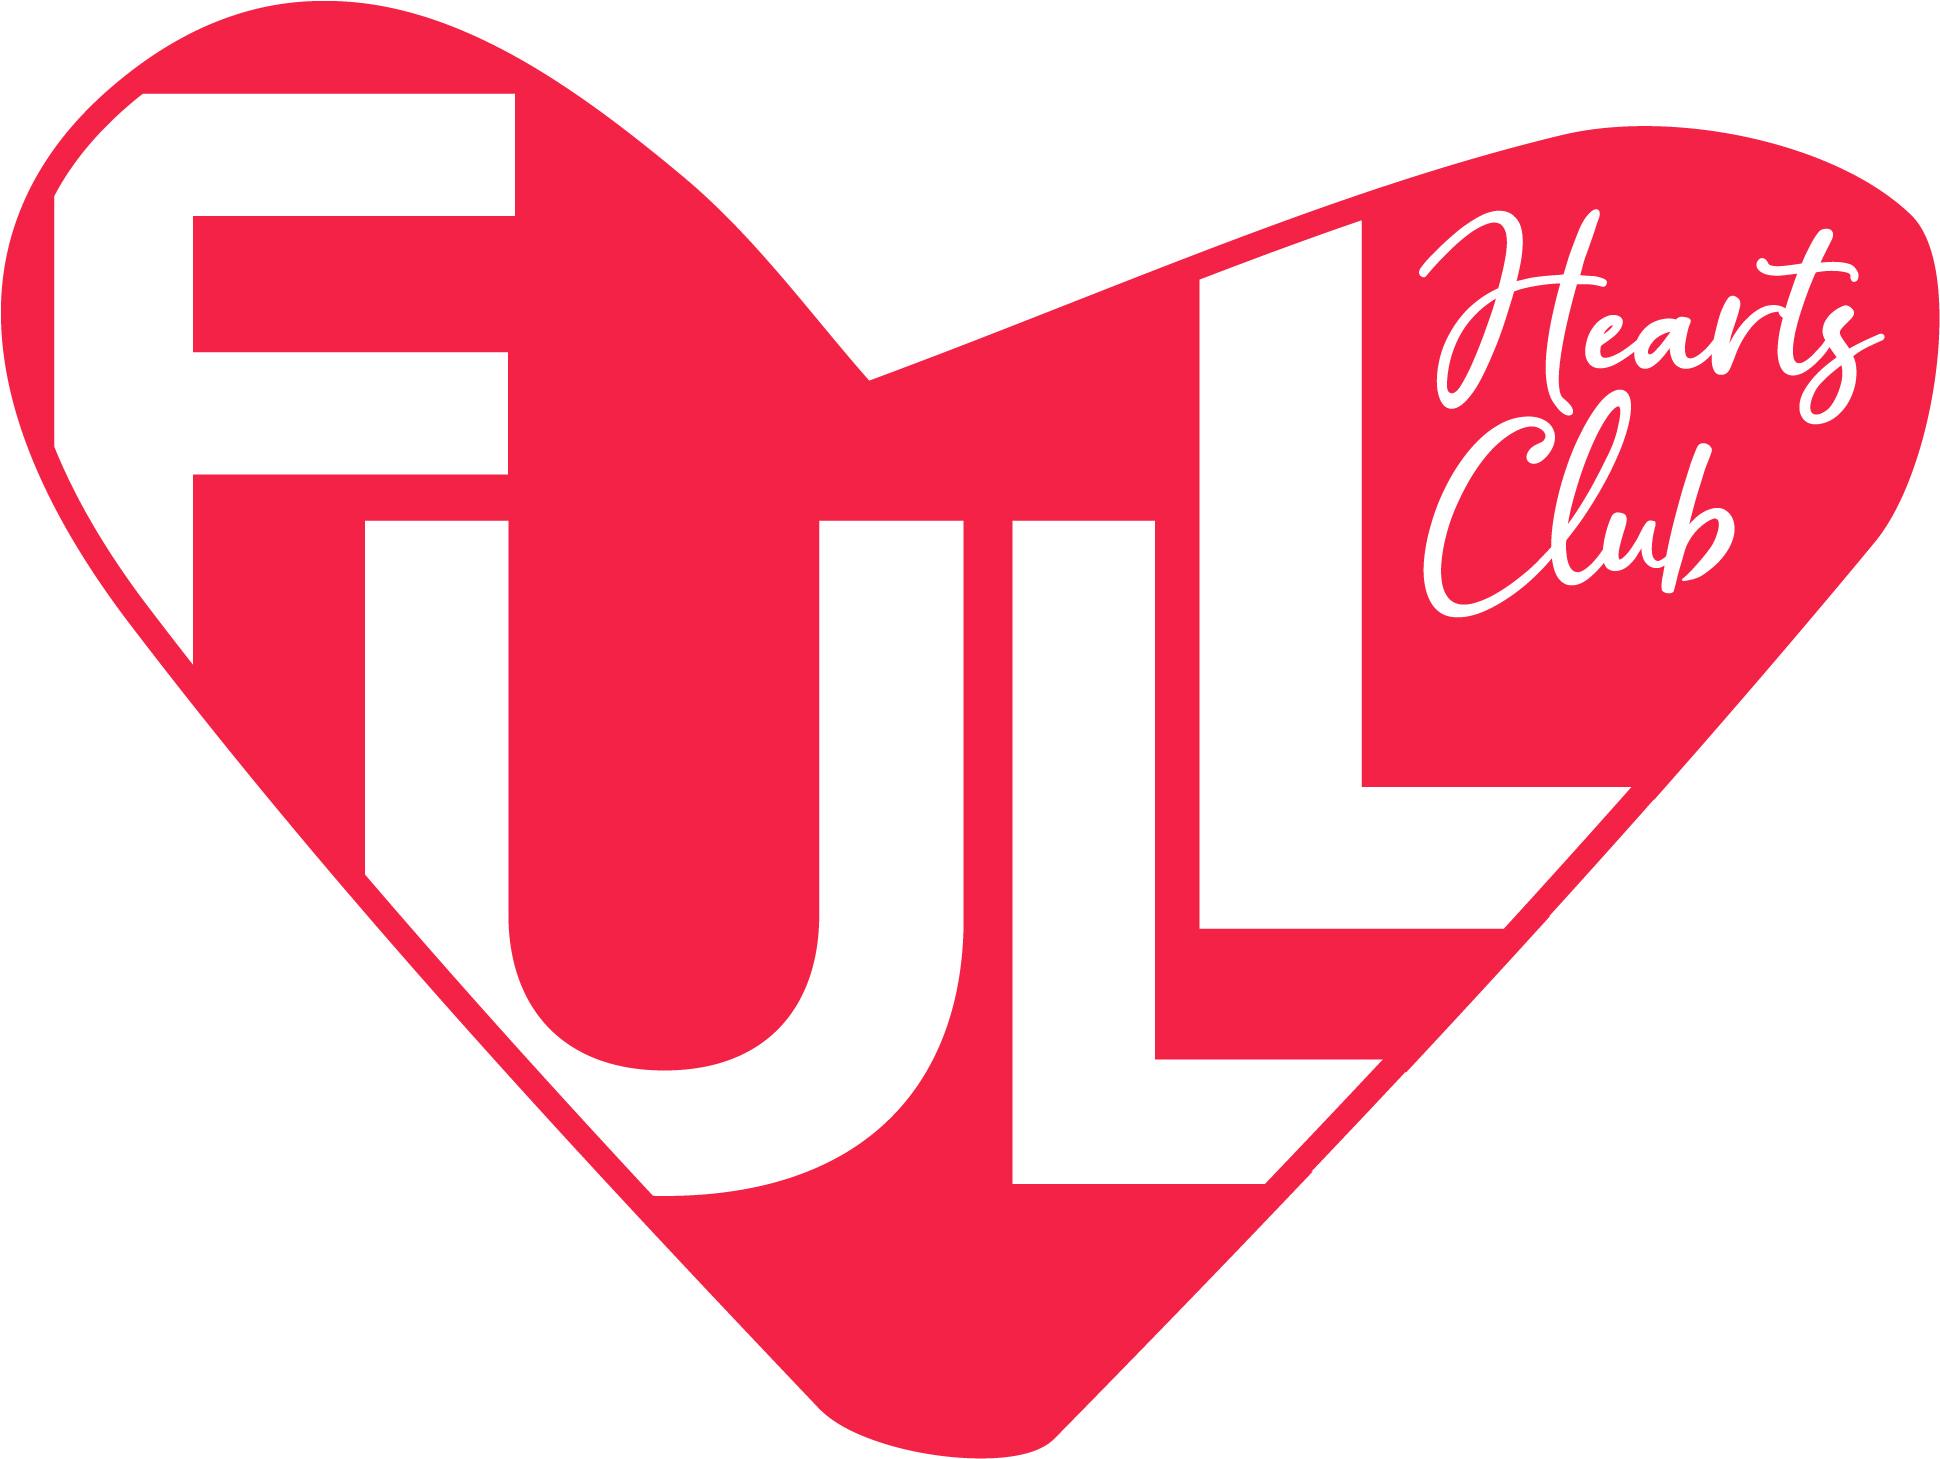 Full Hearts Club_logo red.jpg